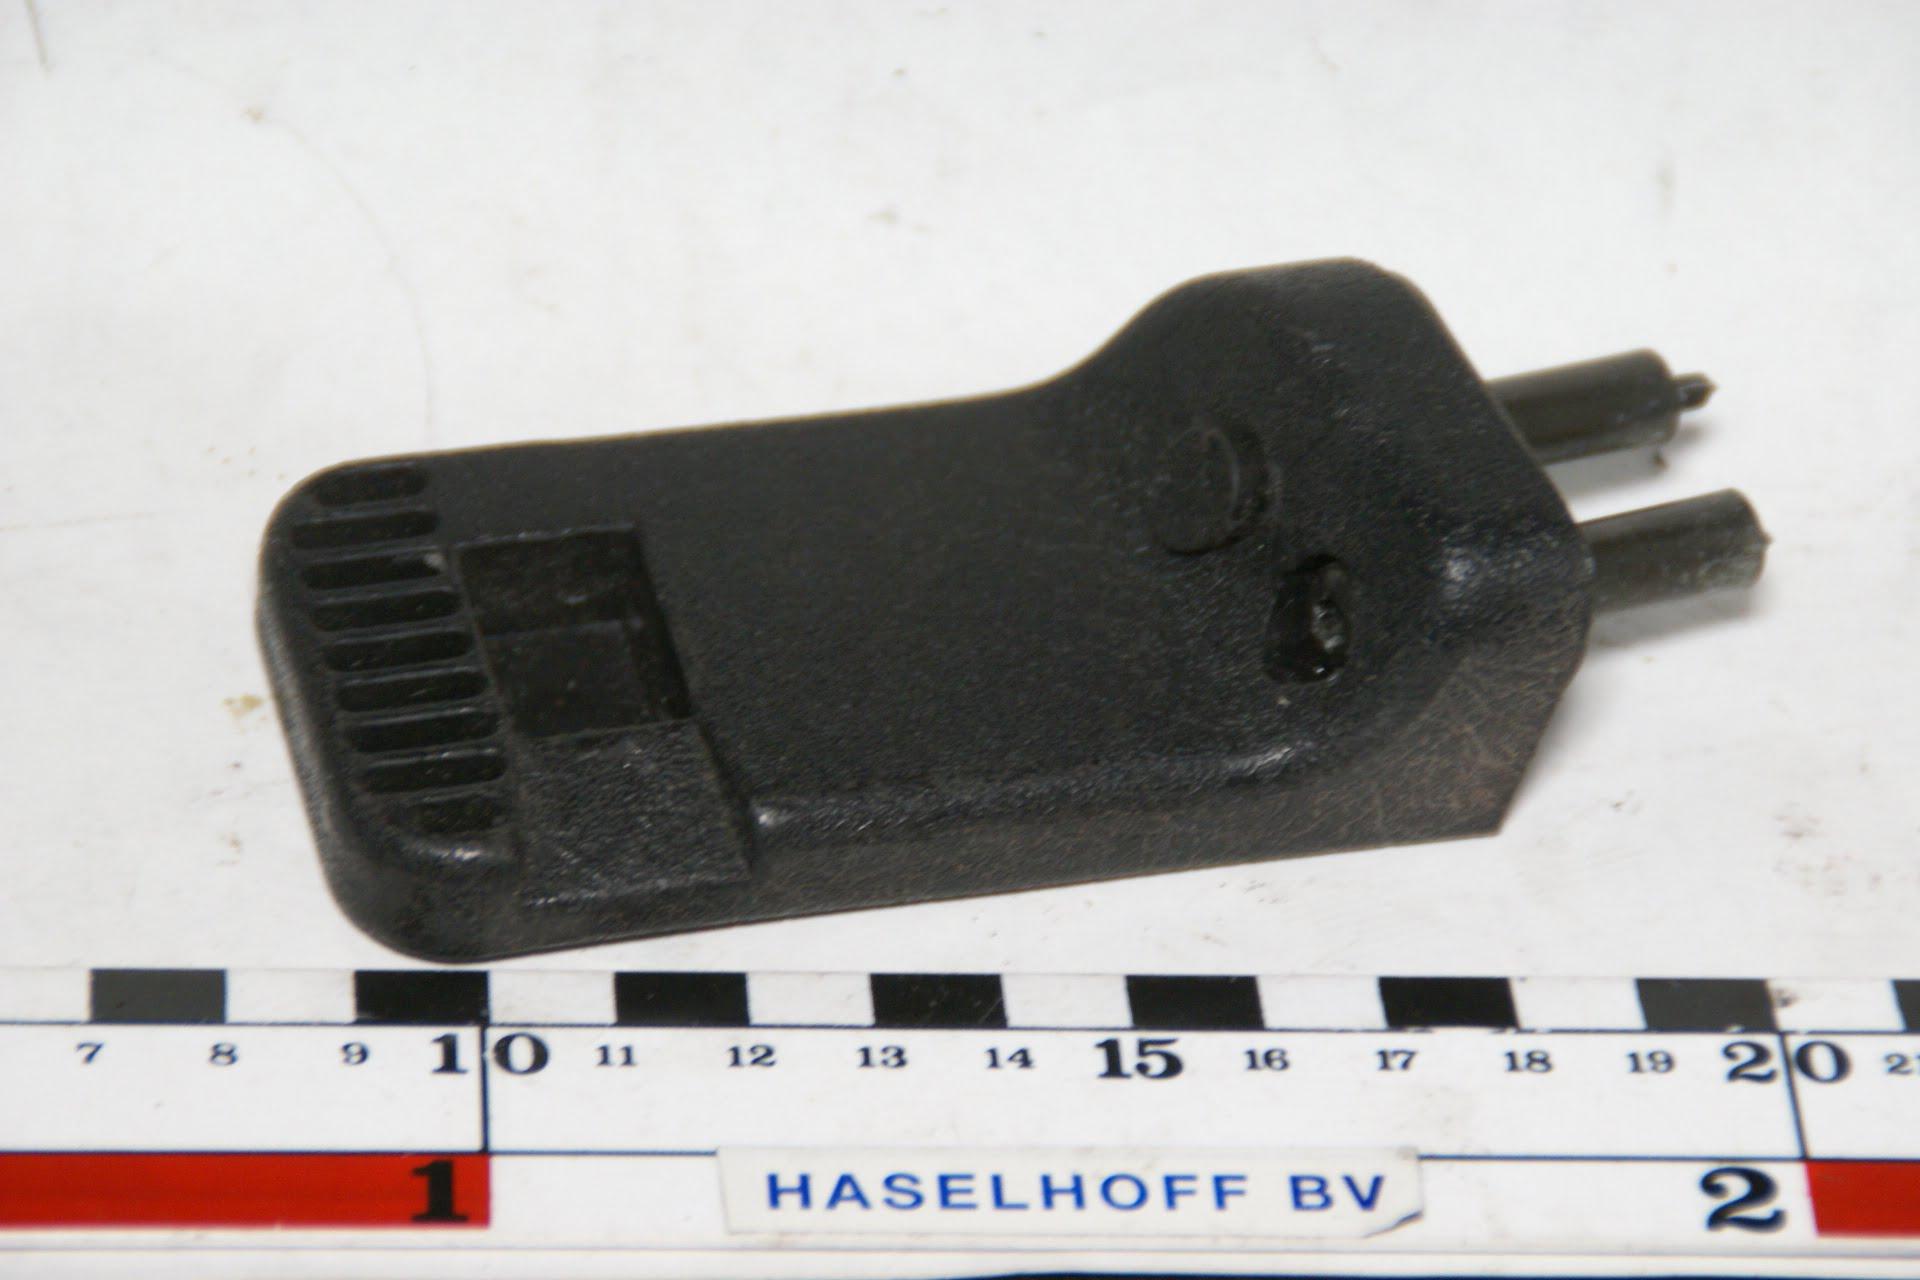 beugel rolhoes zwart 160606-4896-0